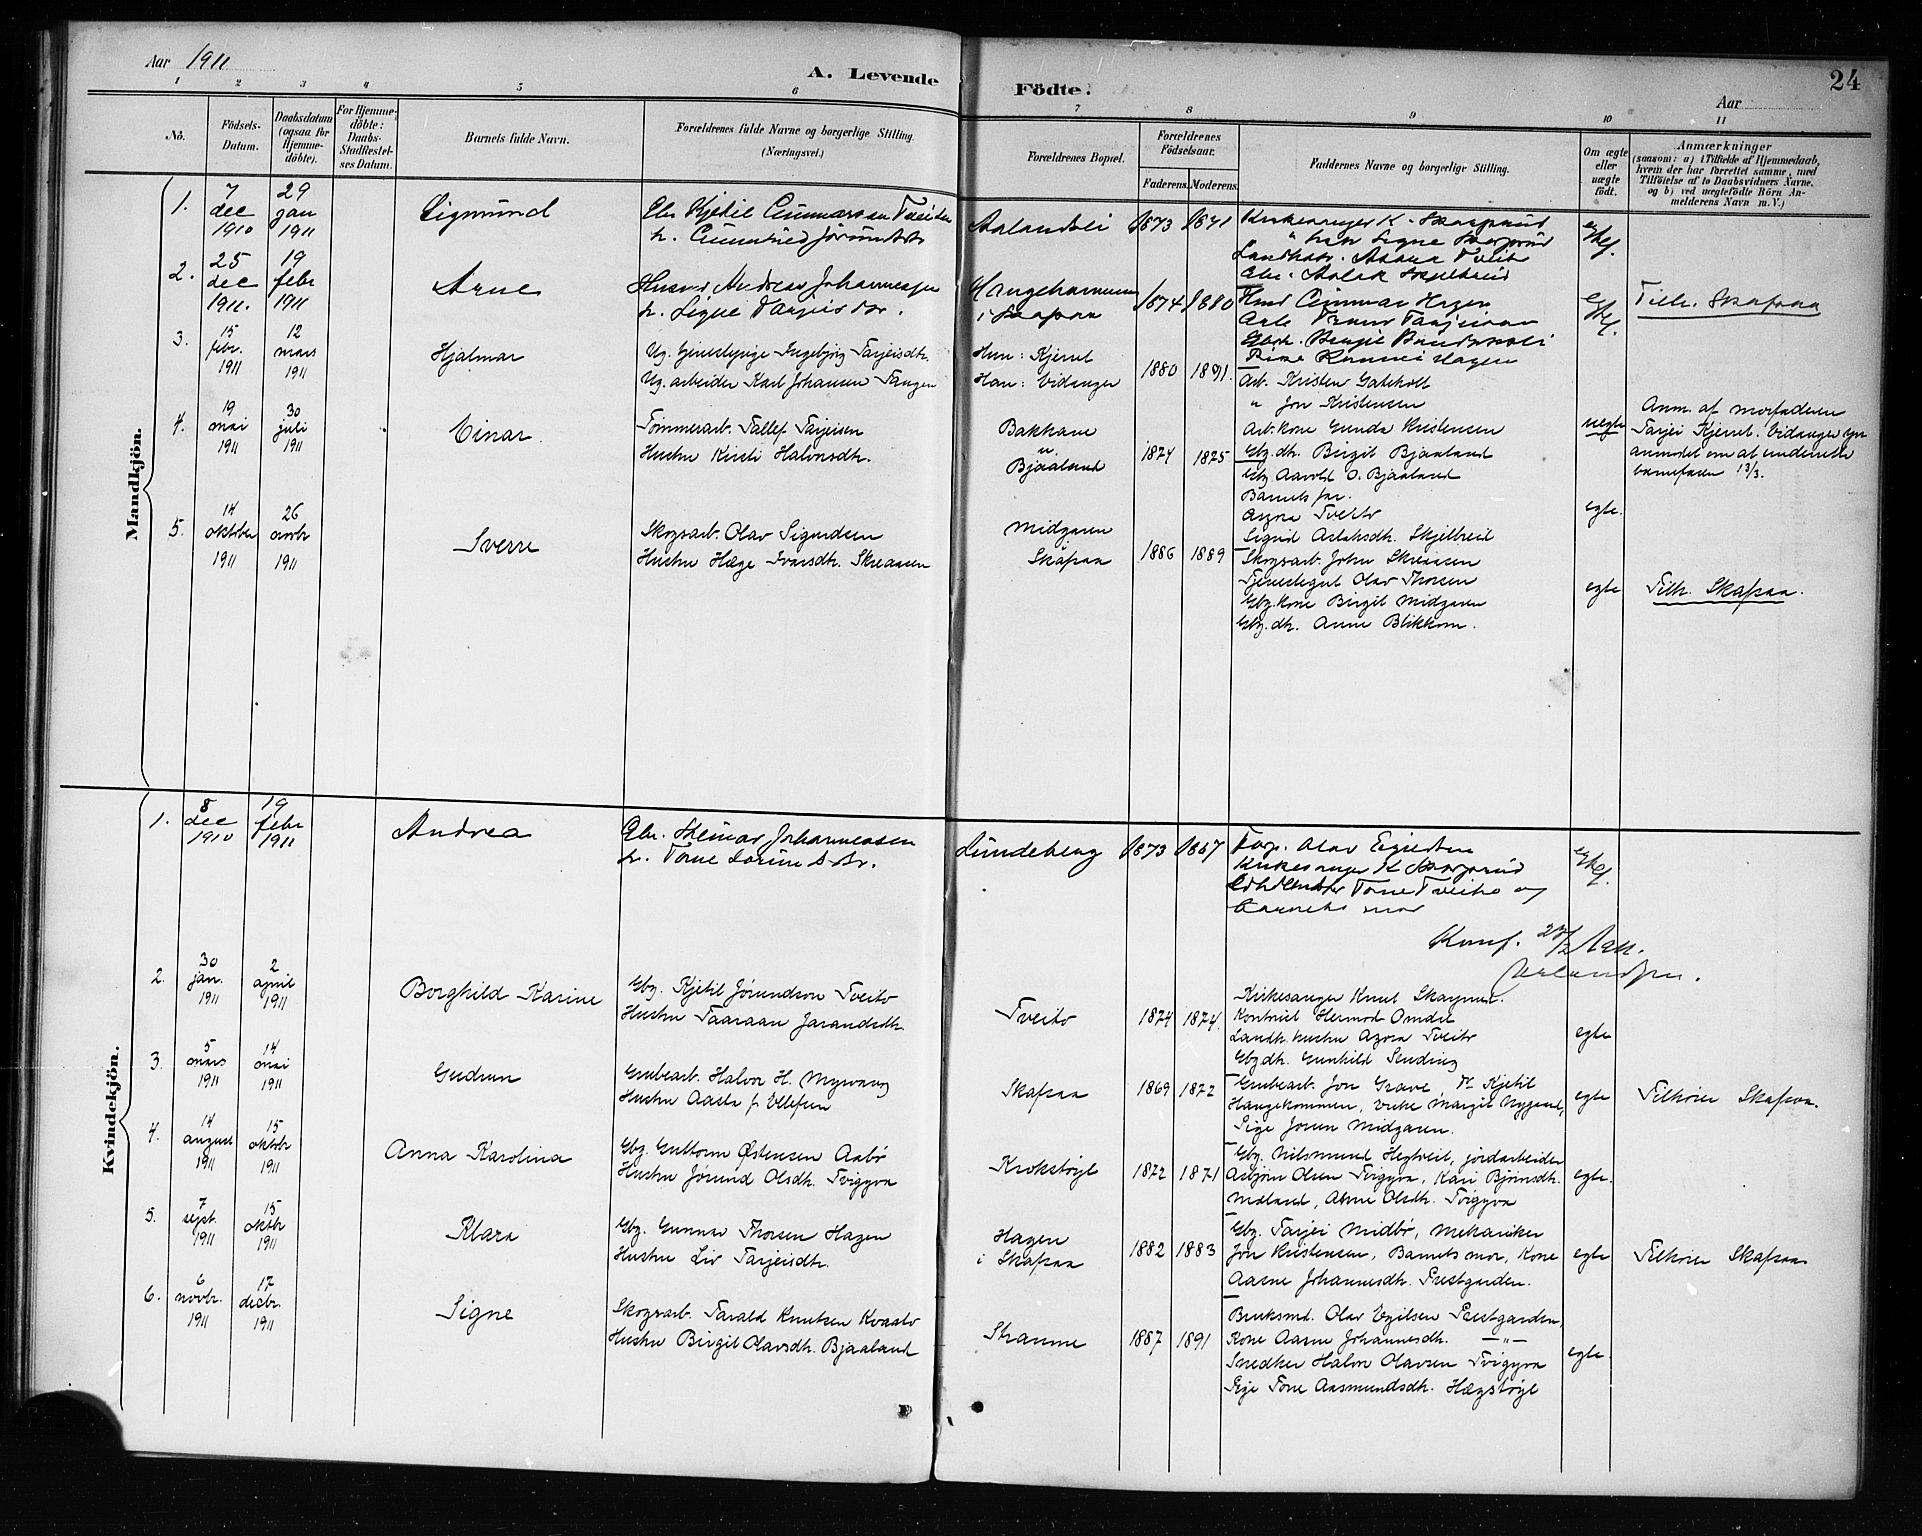 SAKO, Lårdal kirkebøker, G/Ga/L0003: Klokkerbok nr. I 3, 1891-1918, s. 24